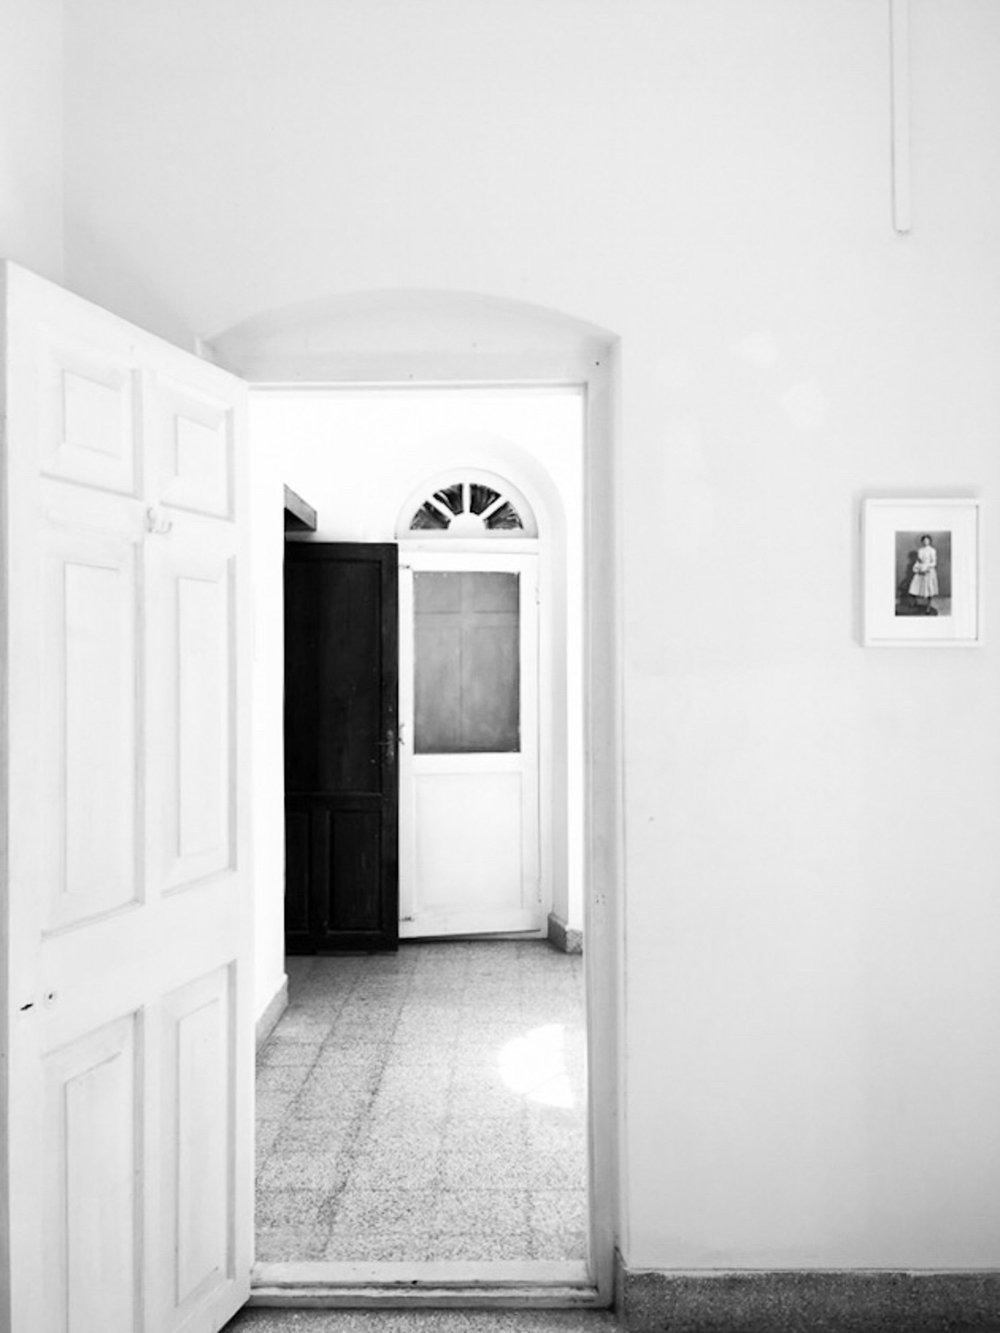 Sindhur_Photography_Kochi Muziris Biennale -2019-17.JPG